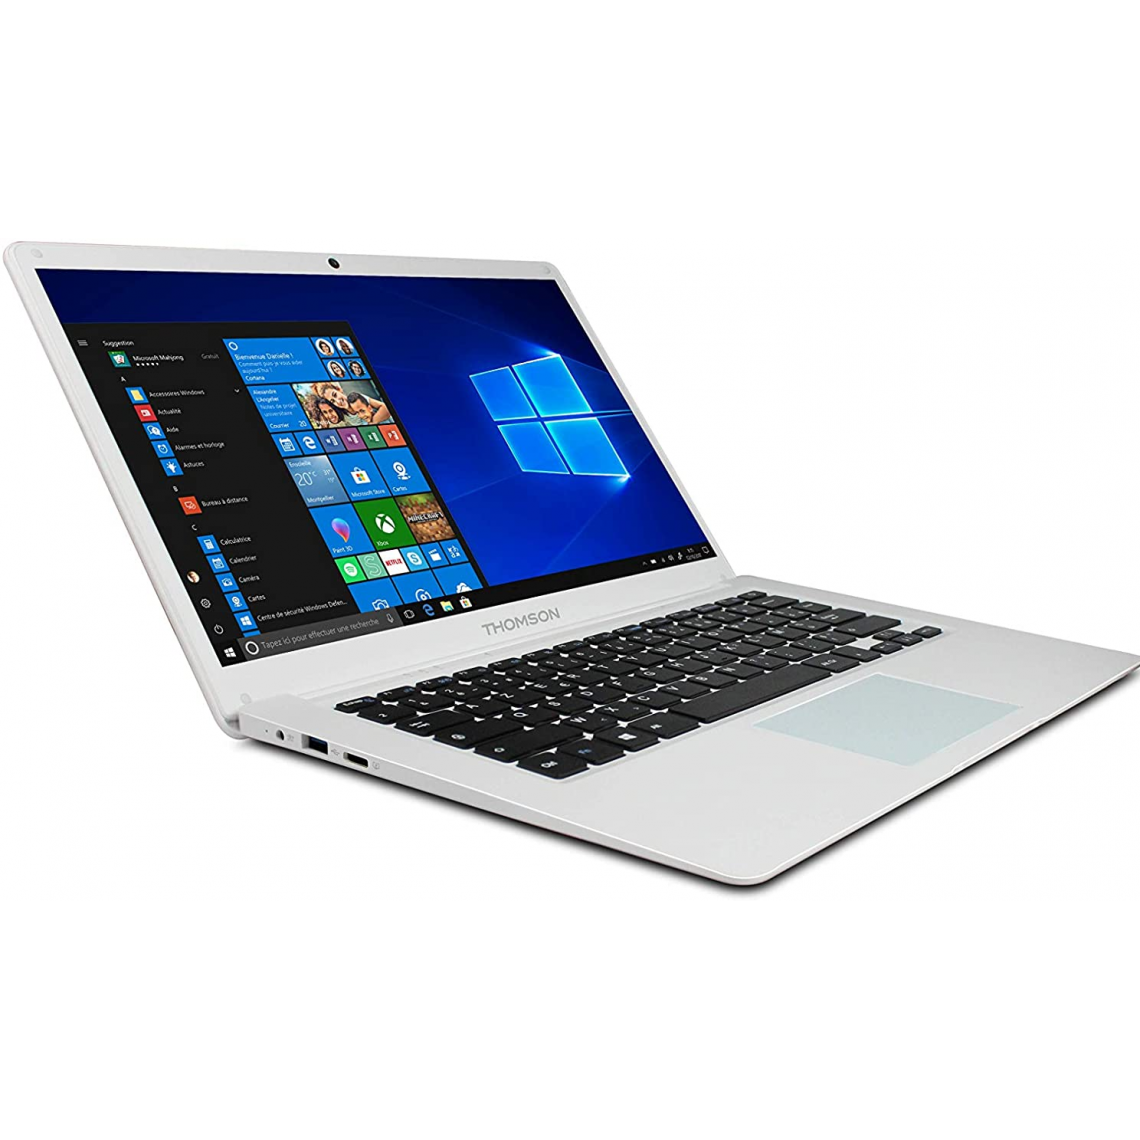 Thomson Notebook Classic N14C4WH64- Blanc